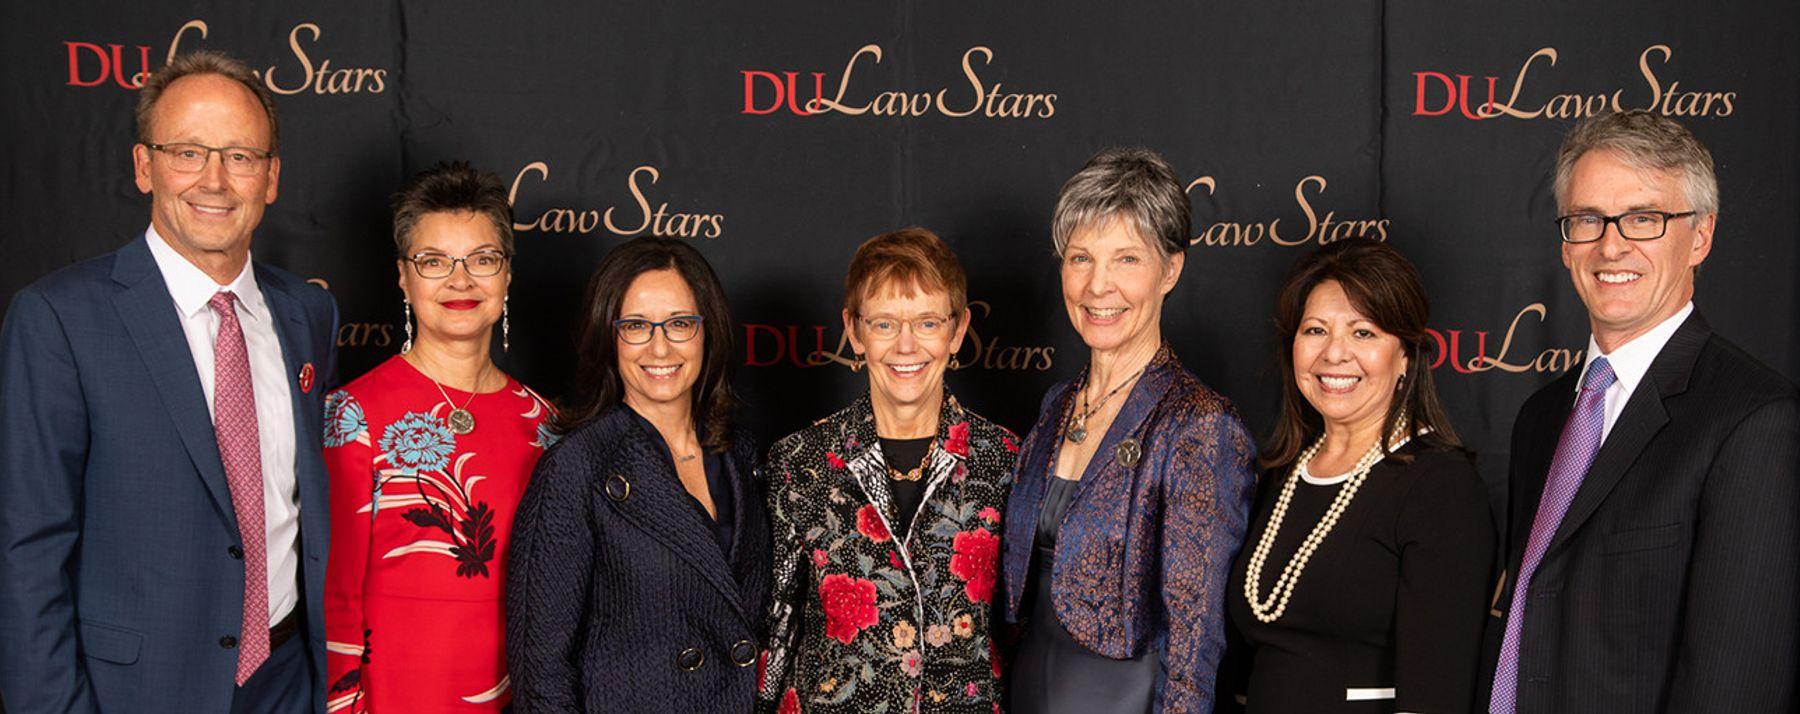 2018 DU Law Stars Honorees